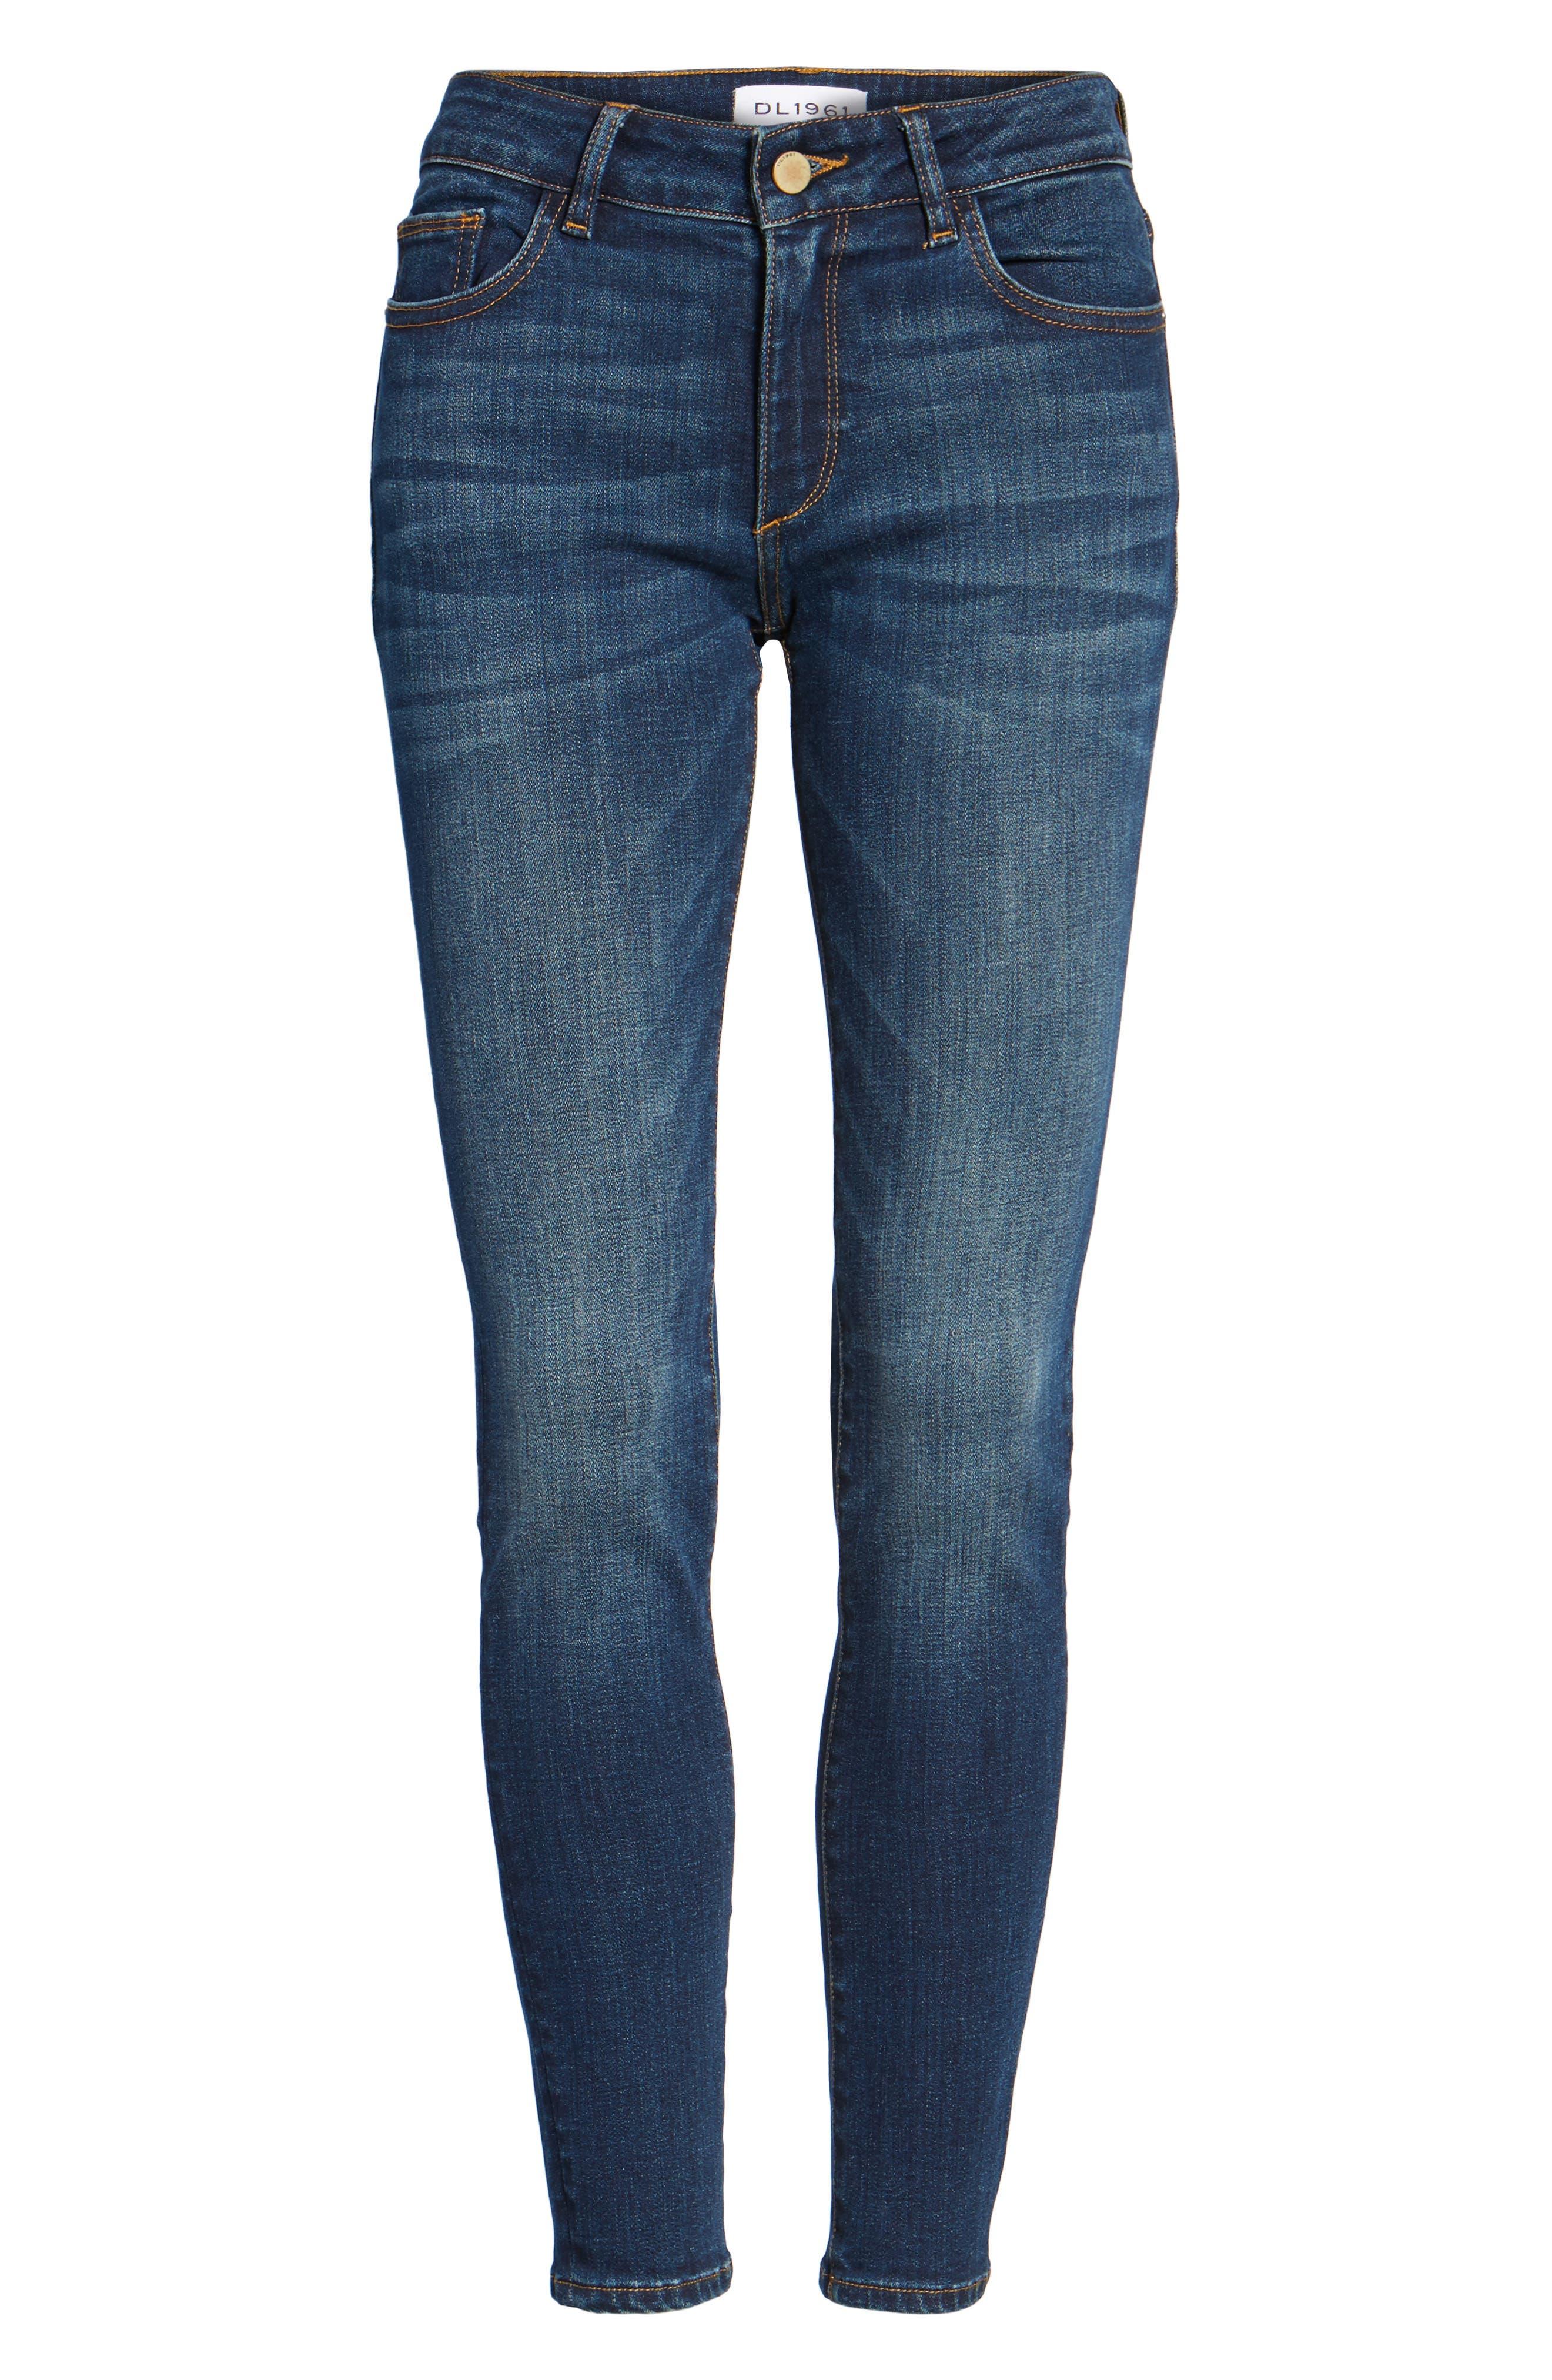 Emma Power Legging Skinny Jeans,                             Alternate thumbnail 7, color,                             Sulton